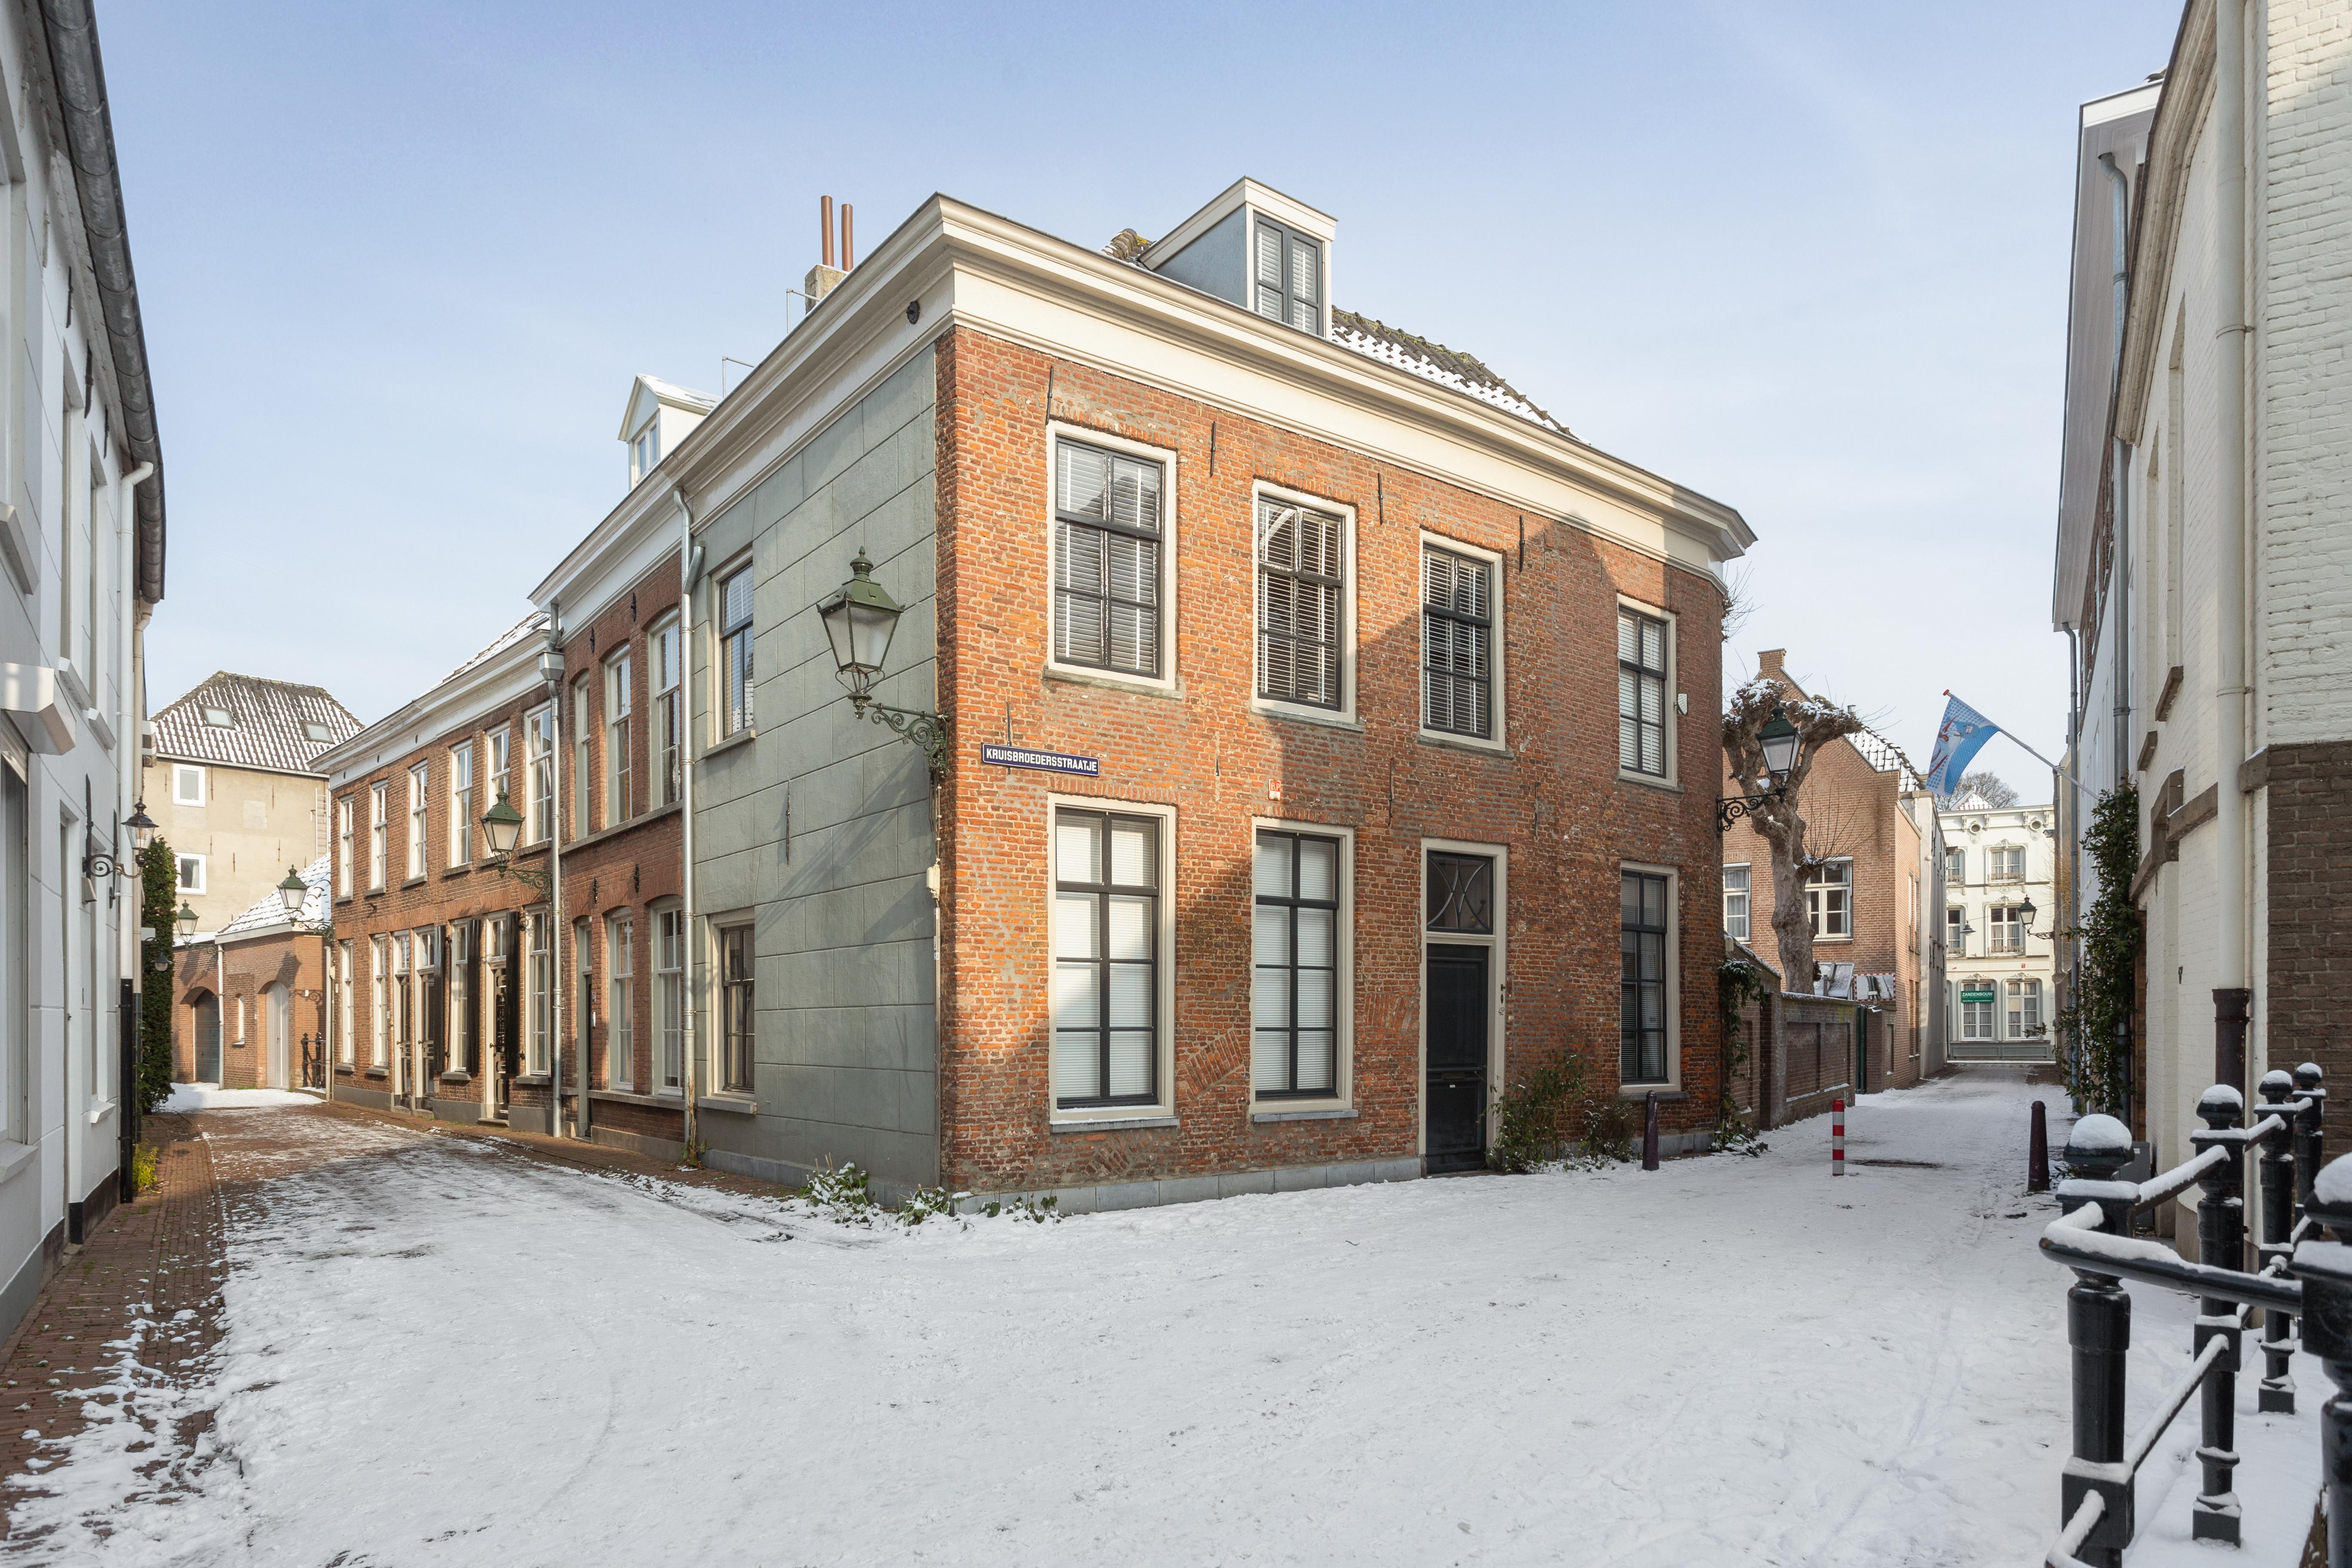 Buitenfotografie Zibber Den Bosch, Nederland